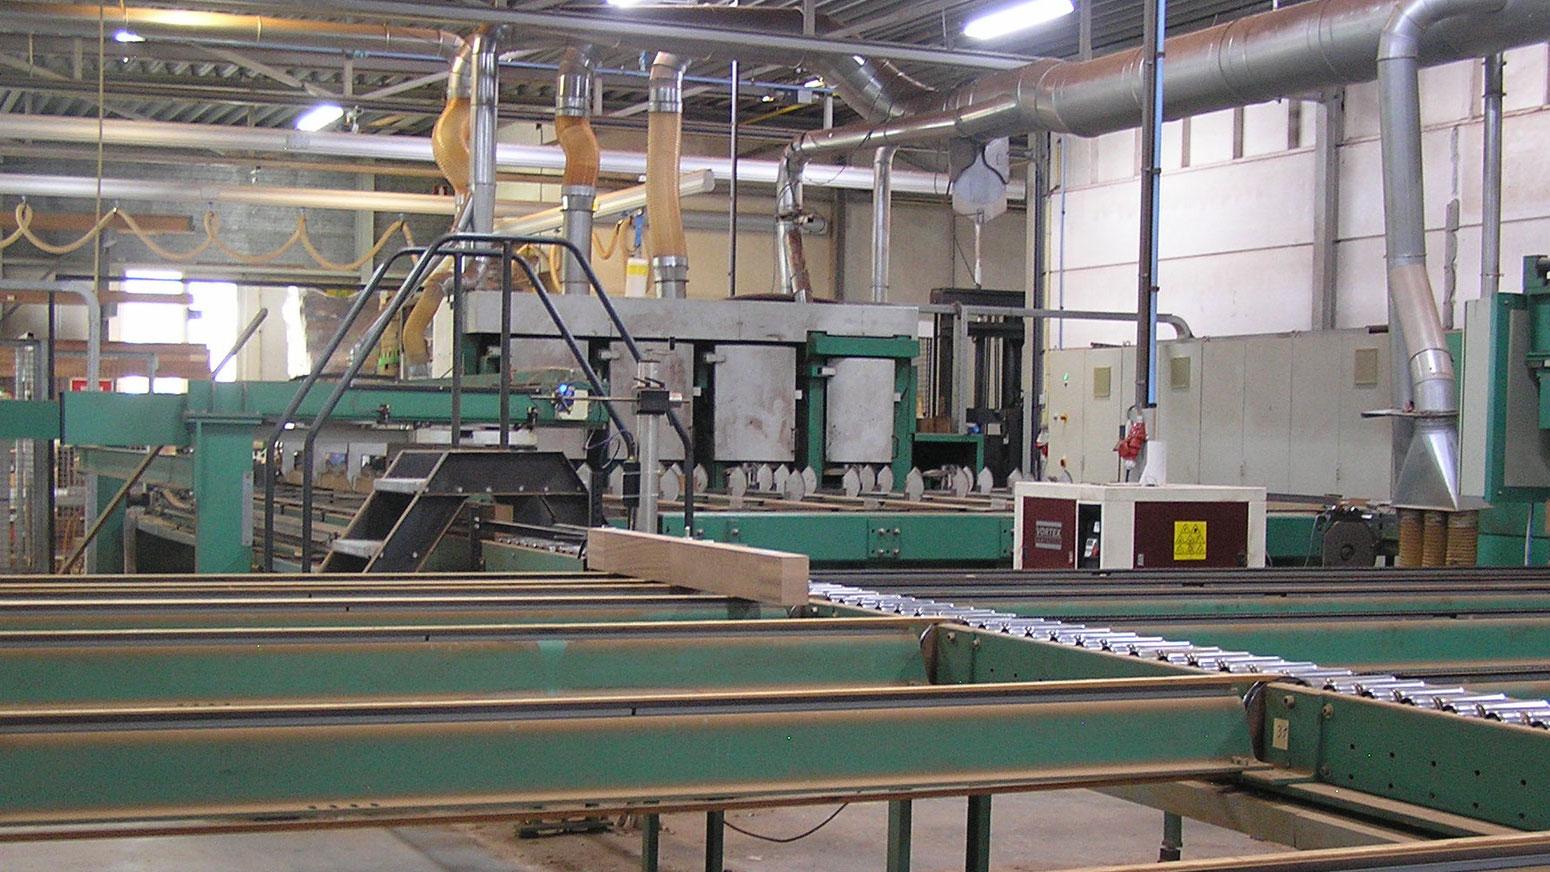 Werkplaats Timmerfabriek Vema B.V.